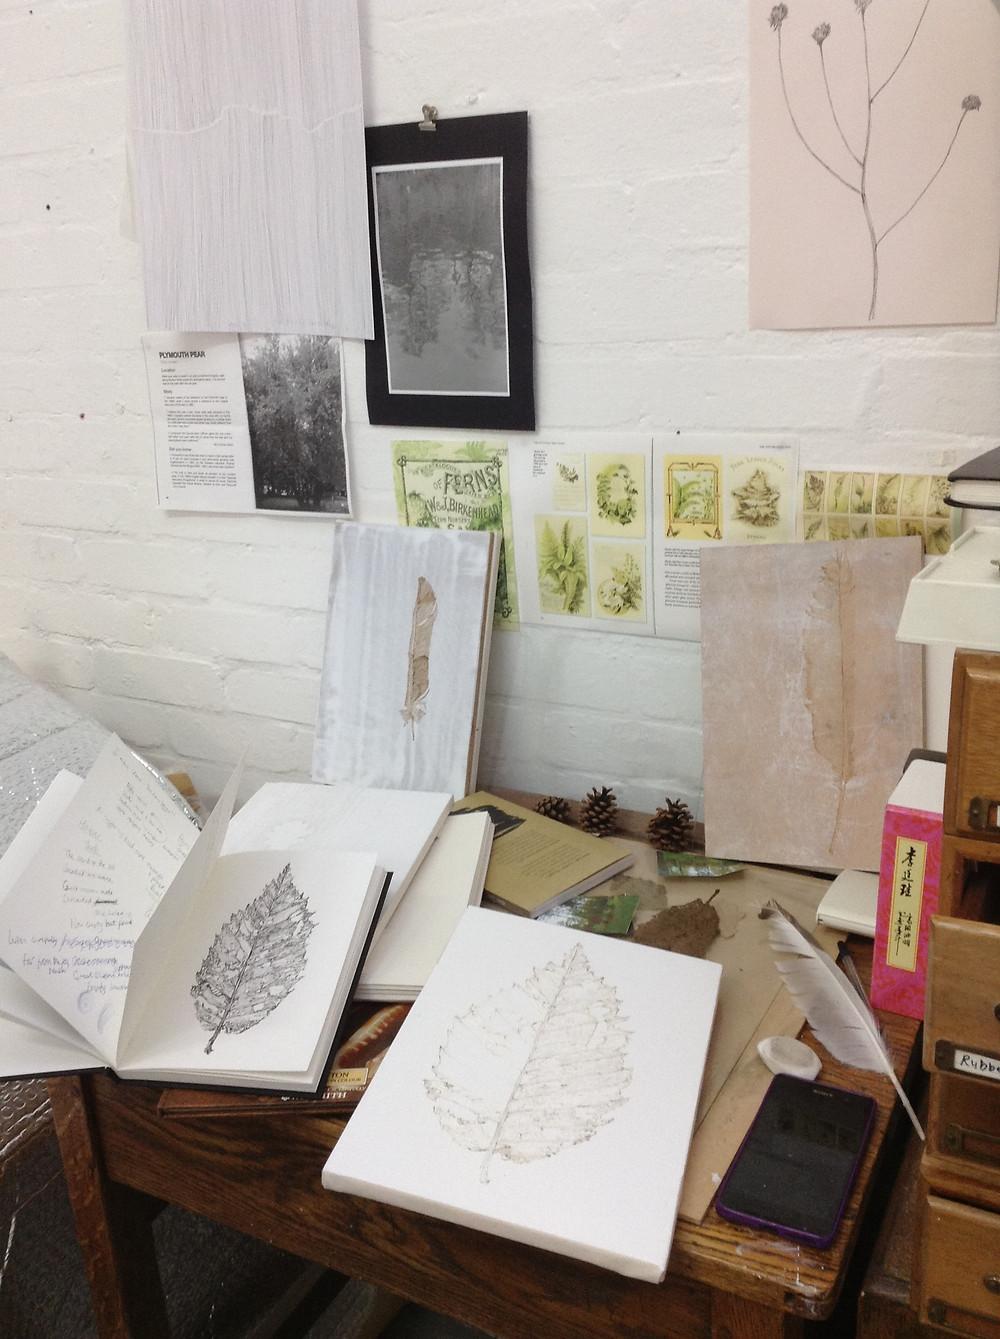 Studio, desk image.